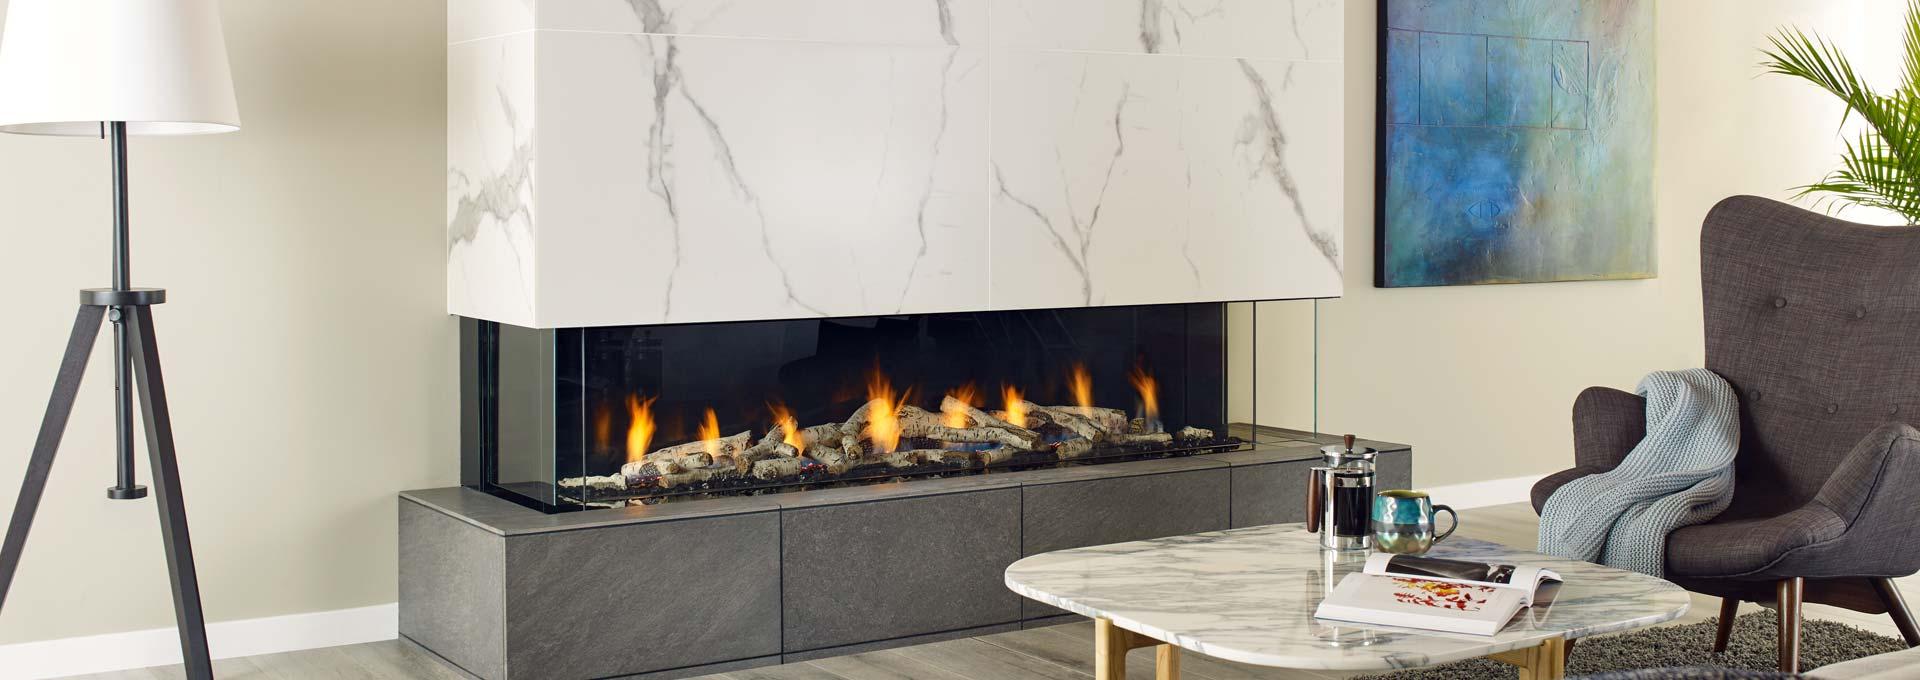 Awe Inspiring Gas Fireplaces Regency Fireplace Products Beutiful Home Inspiration Truamahrainfo